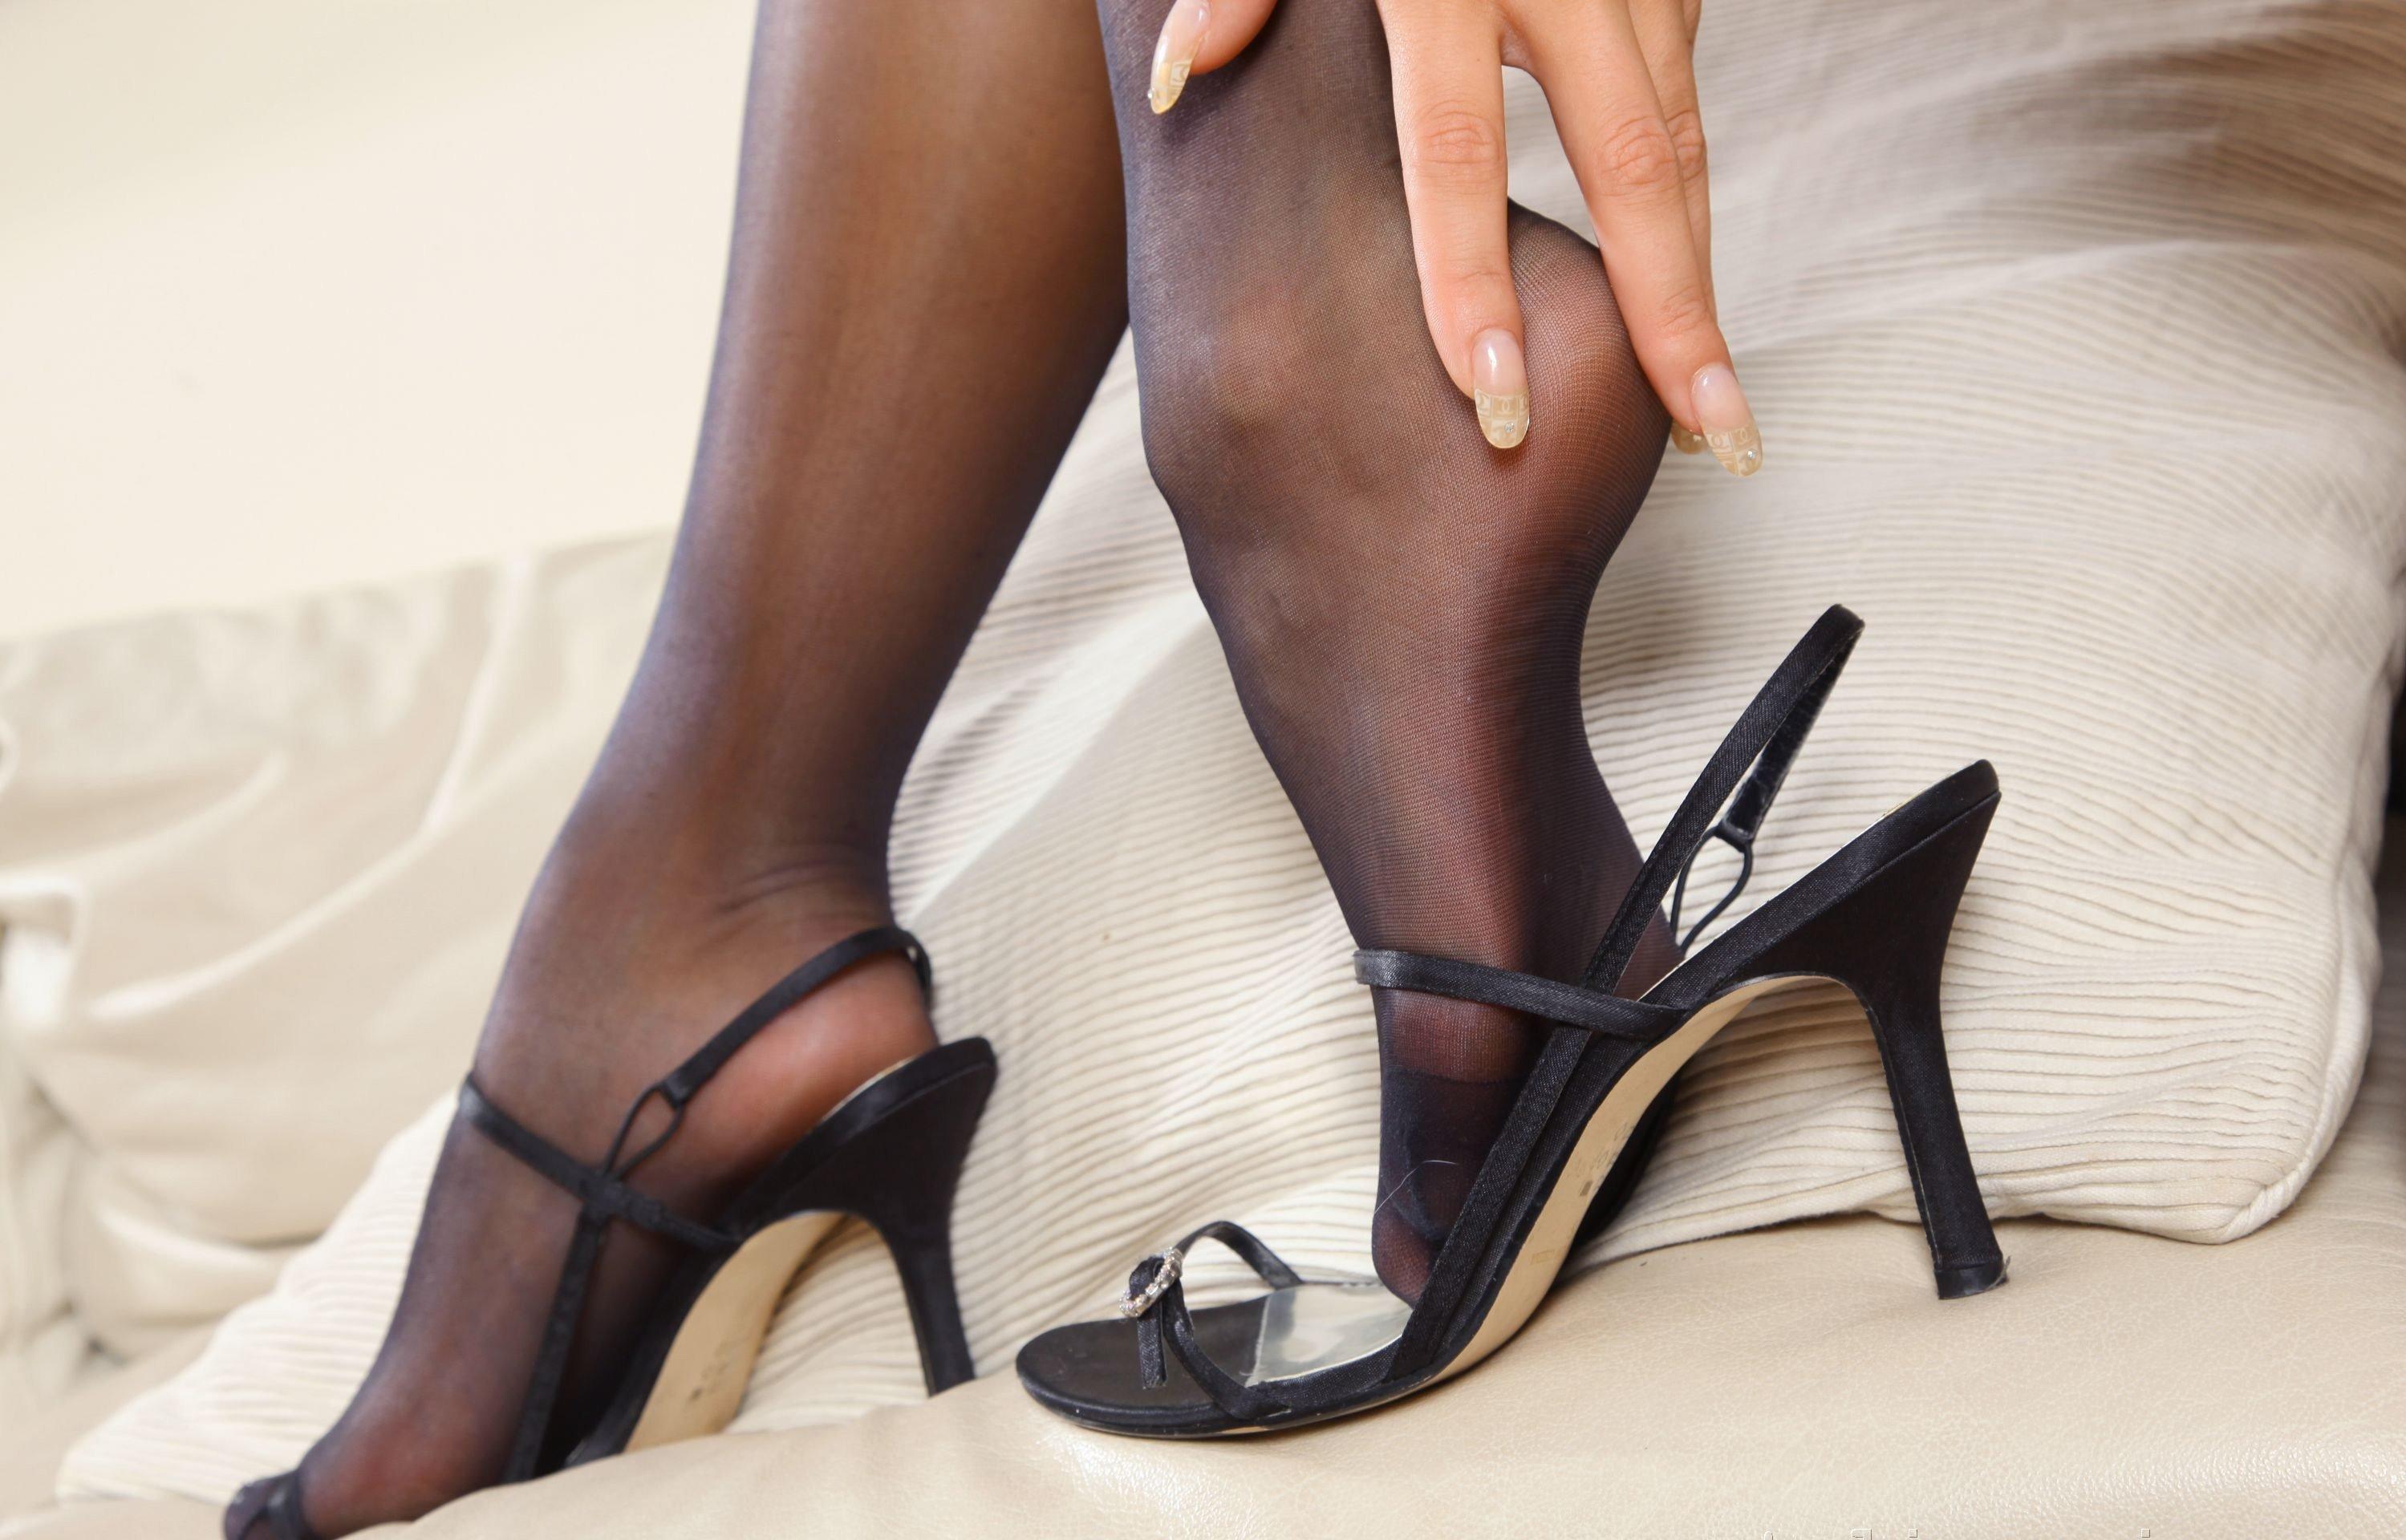 Ножки в капроне и босоножках